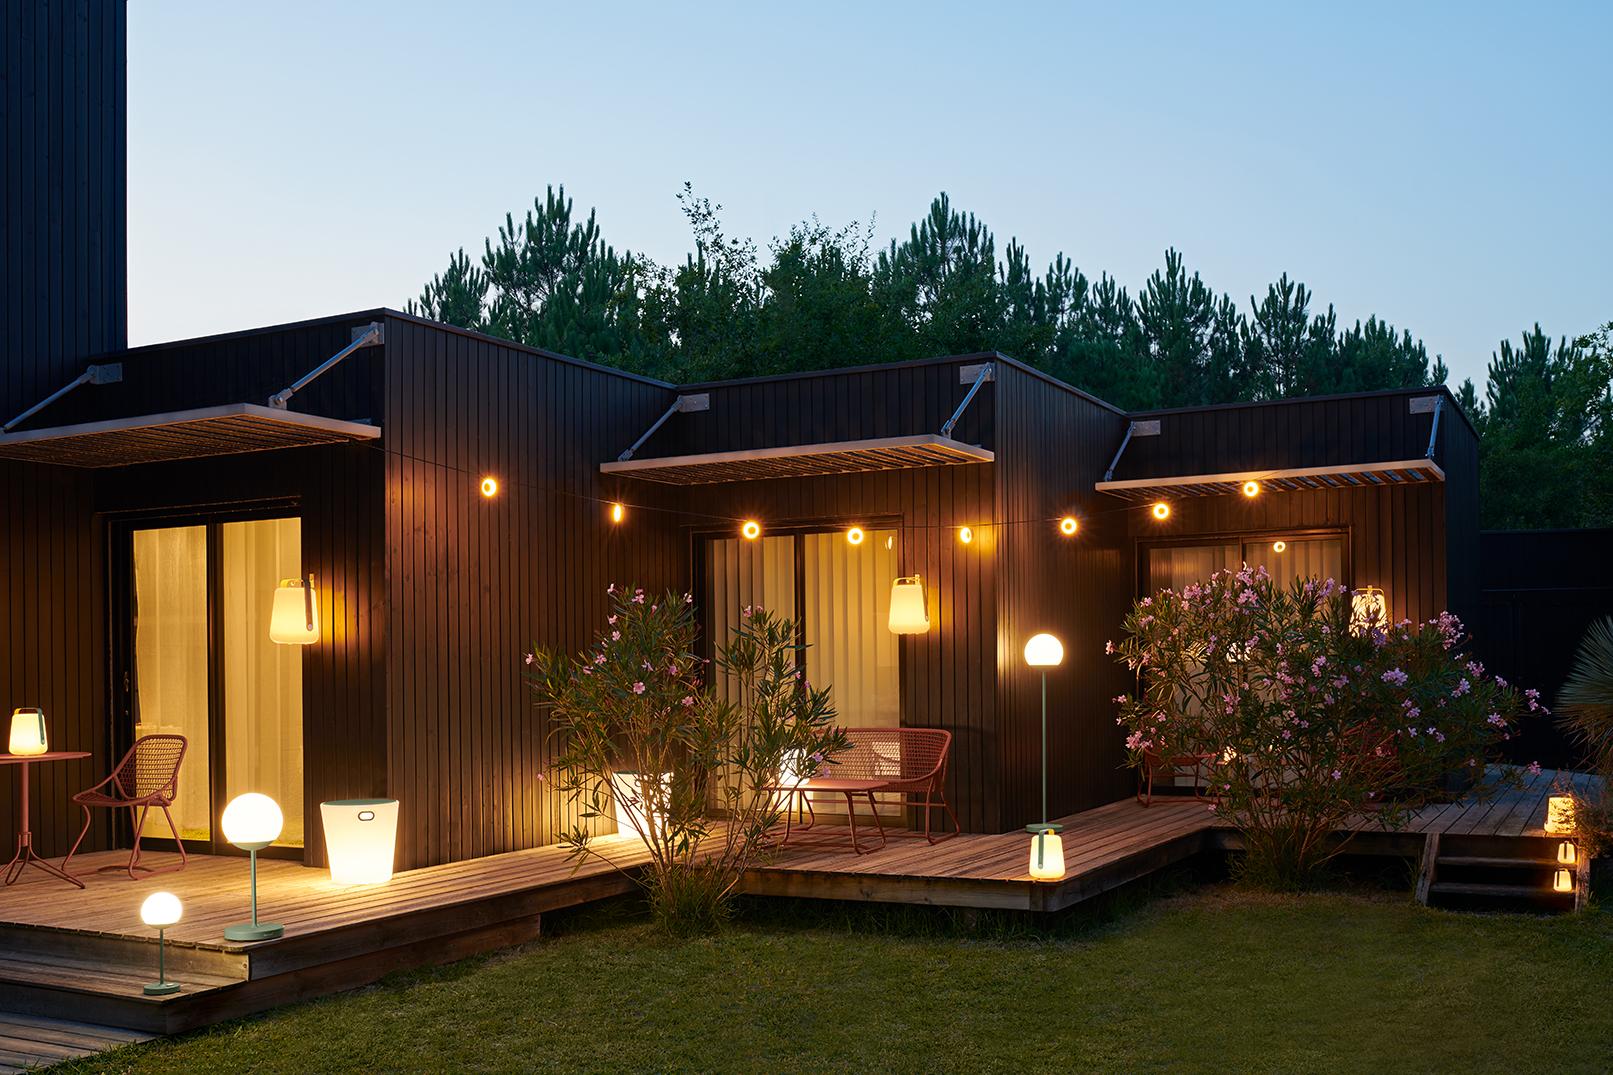 outdoor lamp, lampe exterieur, lampe fermob, moon lamp, lamp balad, balad, pouf exterieur, pouf lumineux